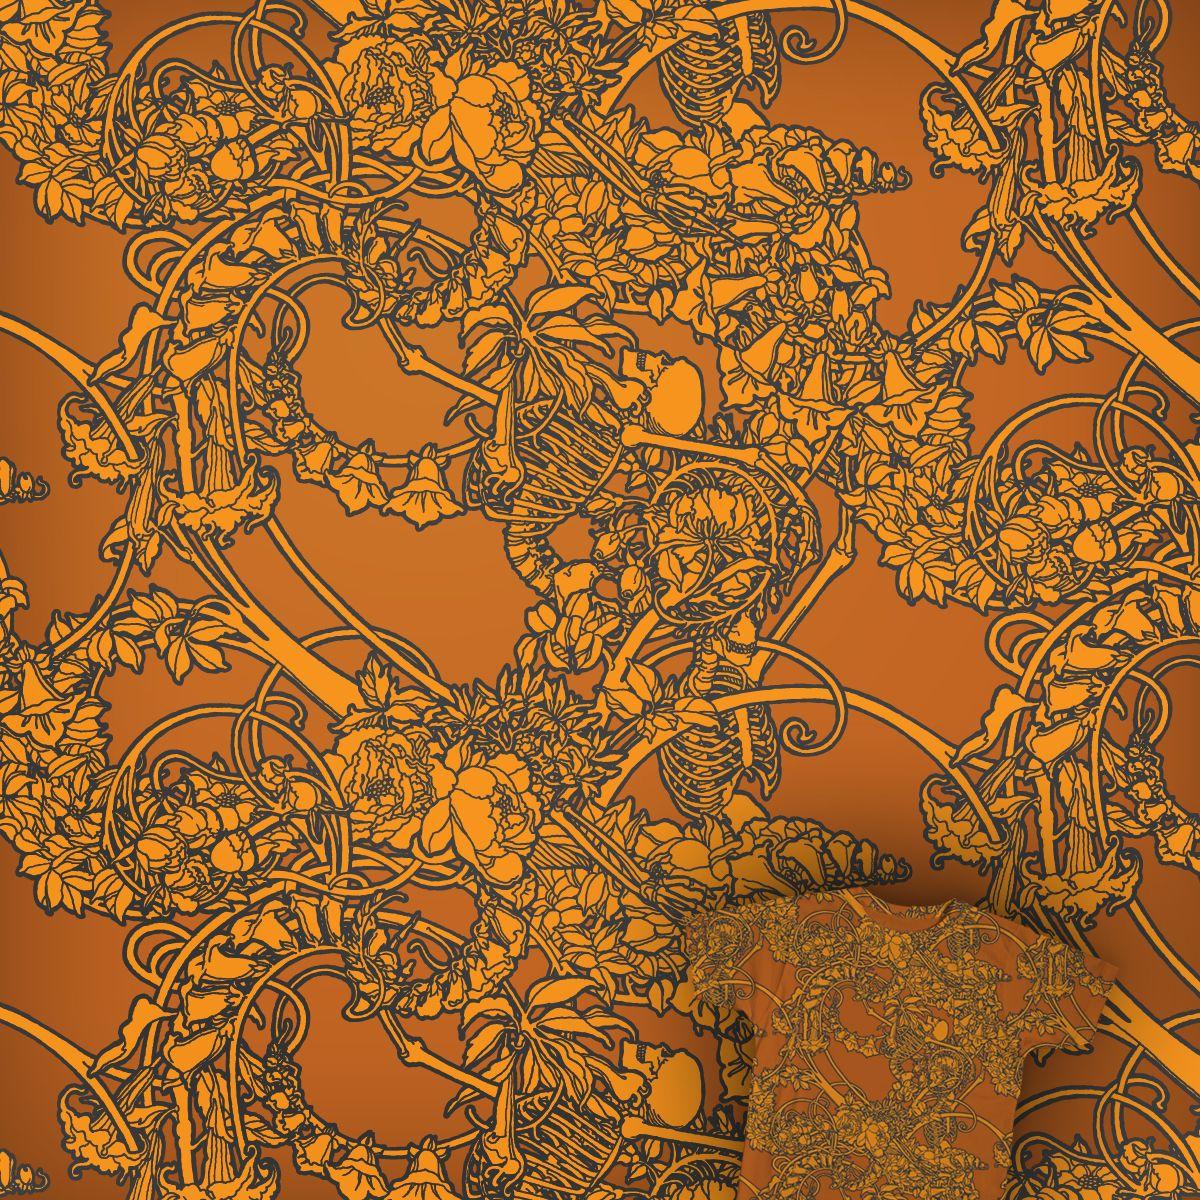 Bones & flowers on Threadless.com. Beautiful pattern from my friend Ilya Novikov.